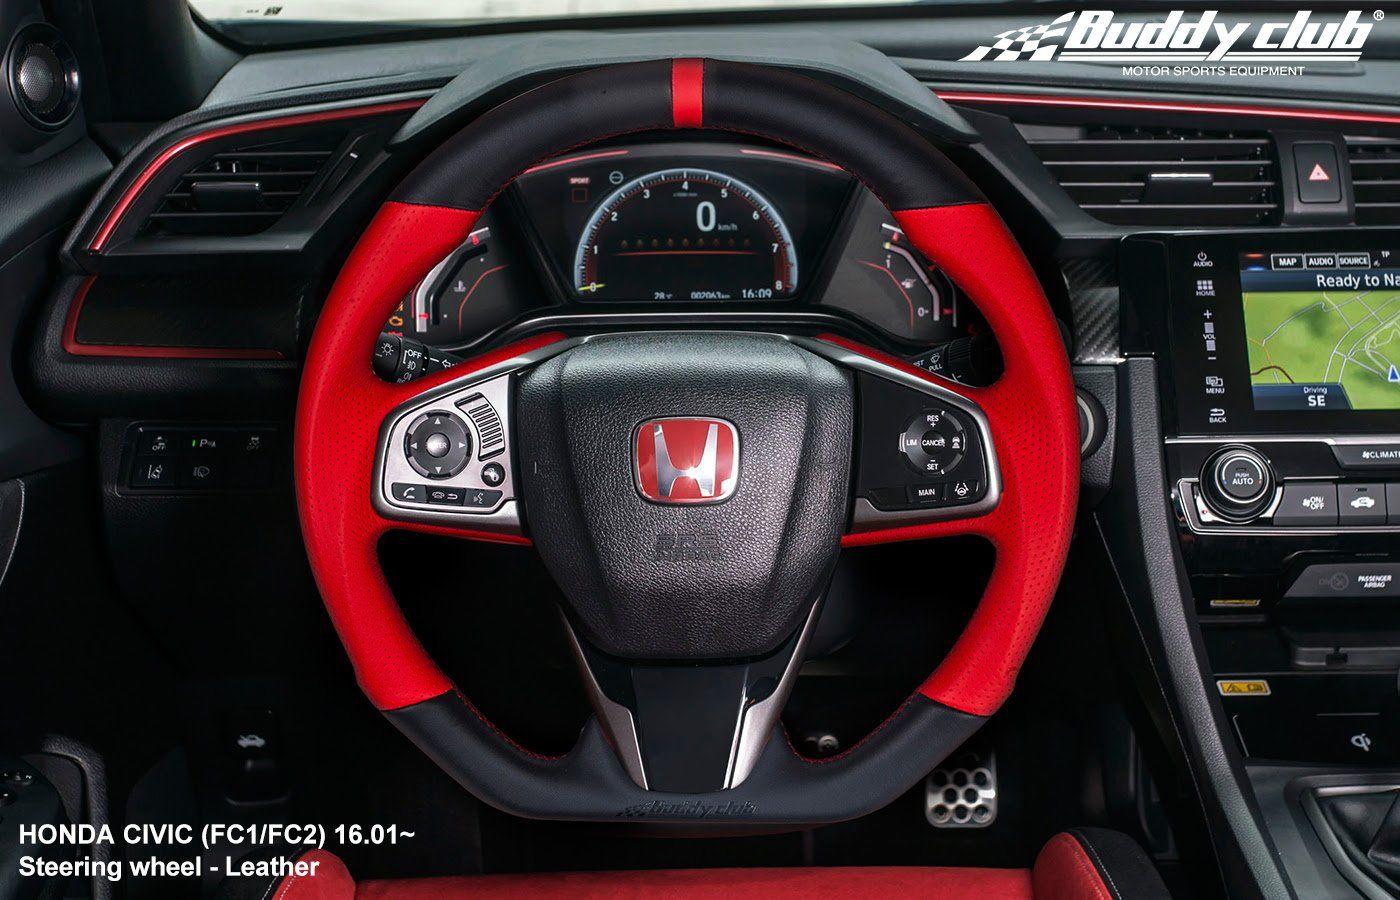 Buddy Club Steering Wheel Honda Civic 16 19 Civic Type R 17 19 Leather Or Carbon Honda Civic Honda Civic Sport Honda Civic Si